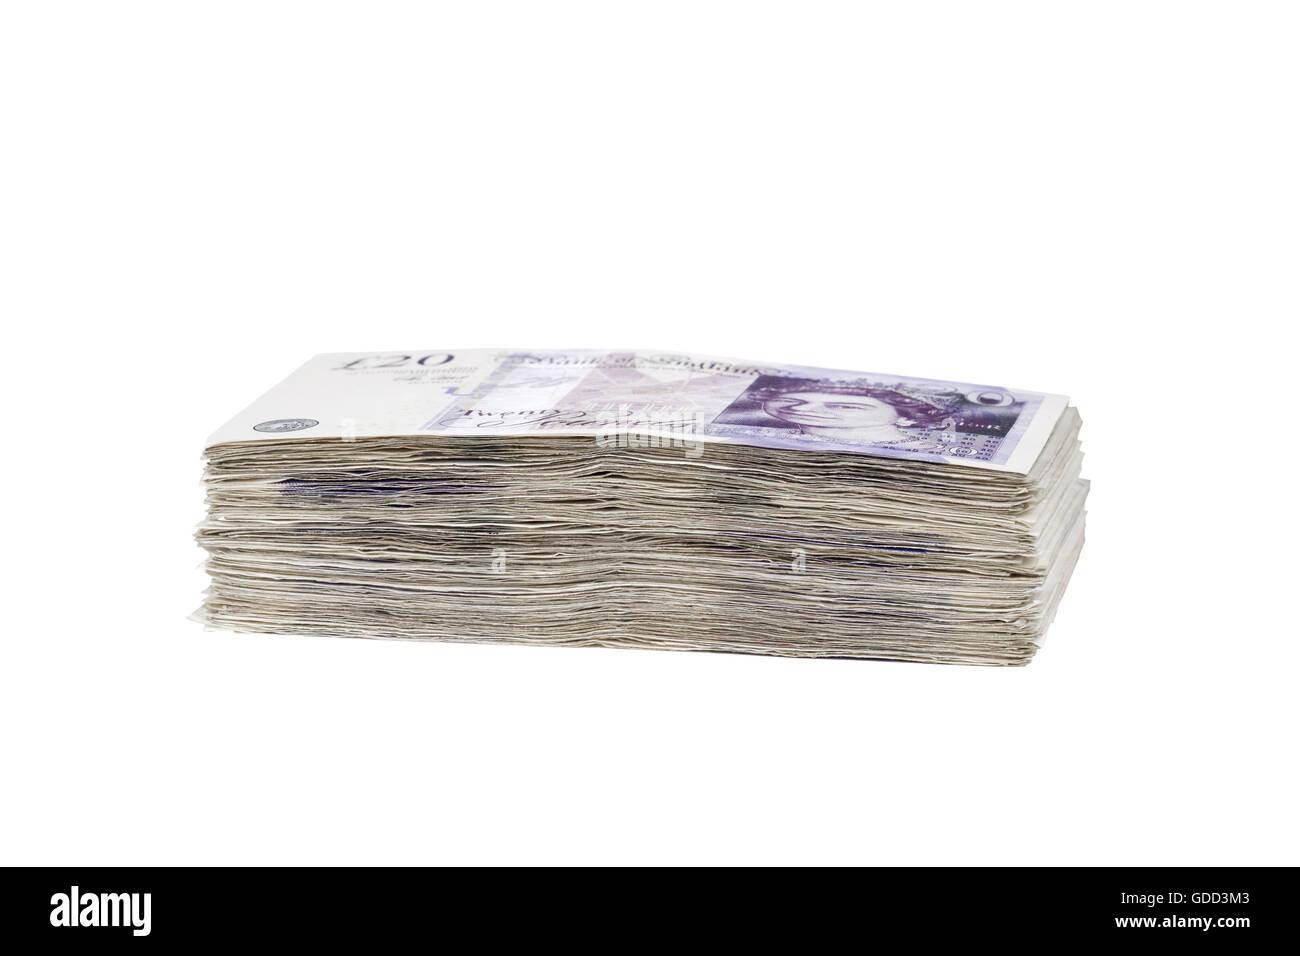 Pile of british 20 pound banknotes - Stock Image